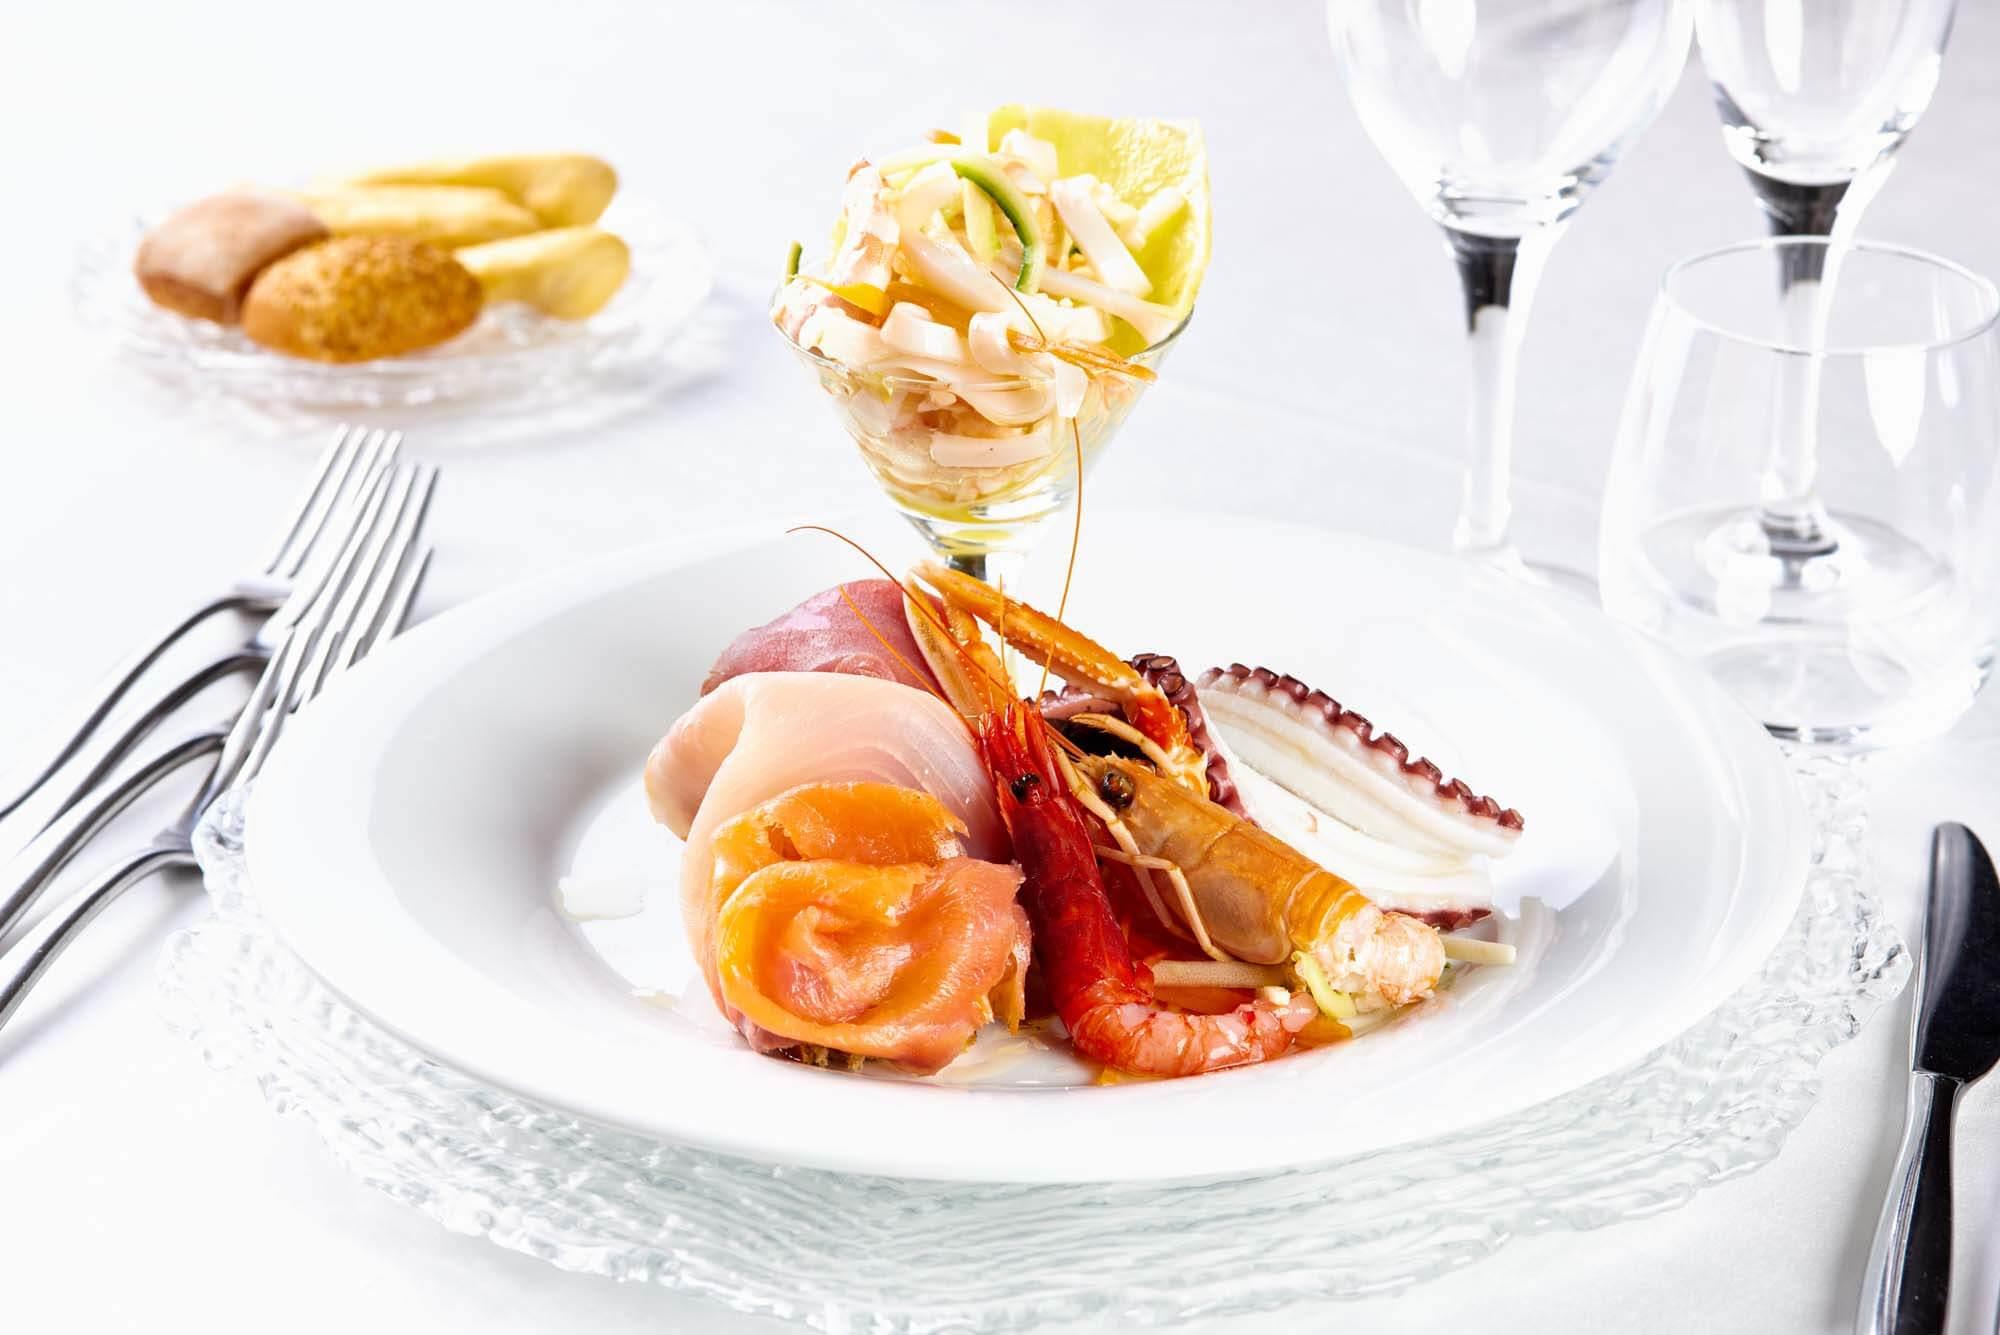 bbadv-photoshooting-food-villa-fabiana-02